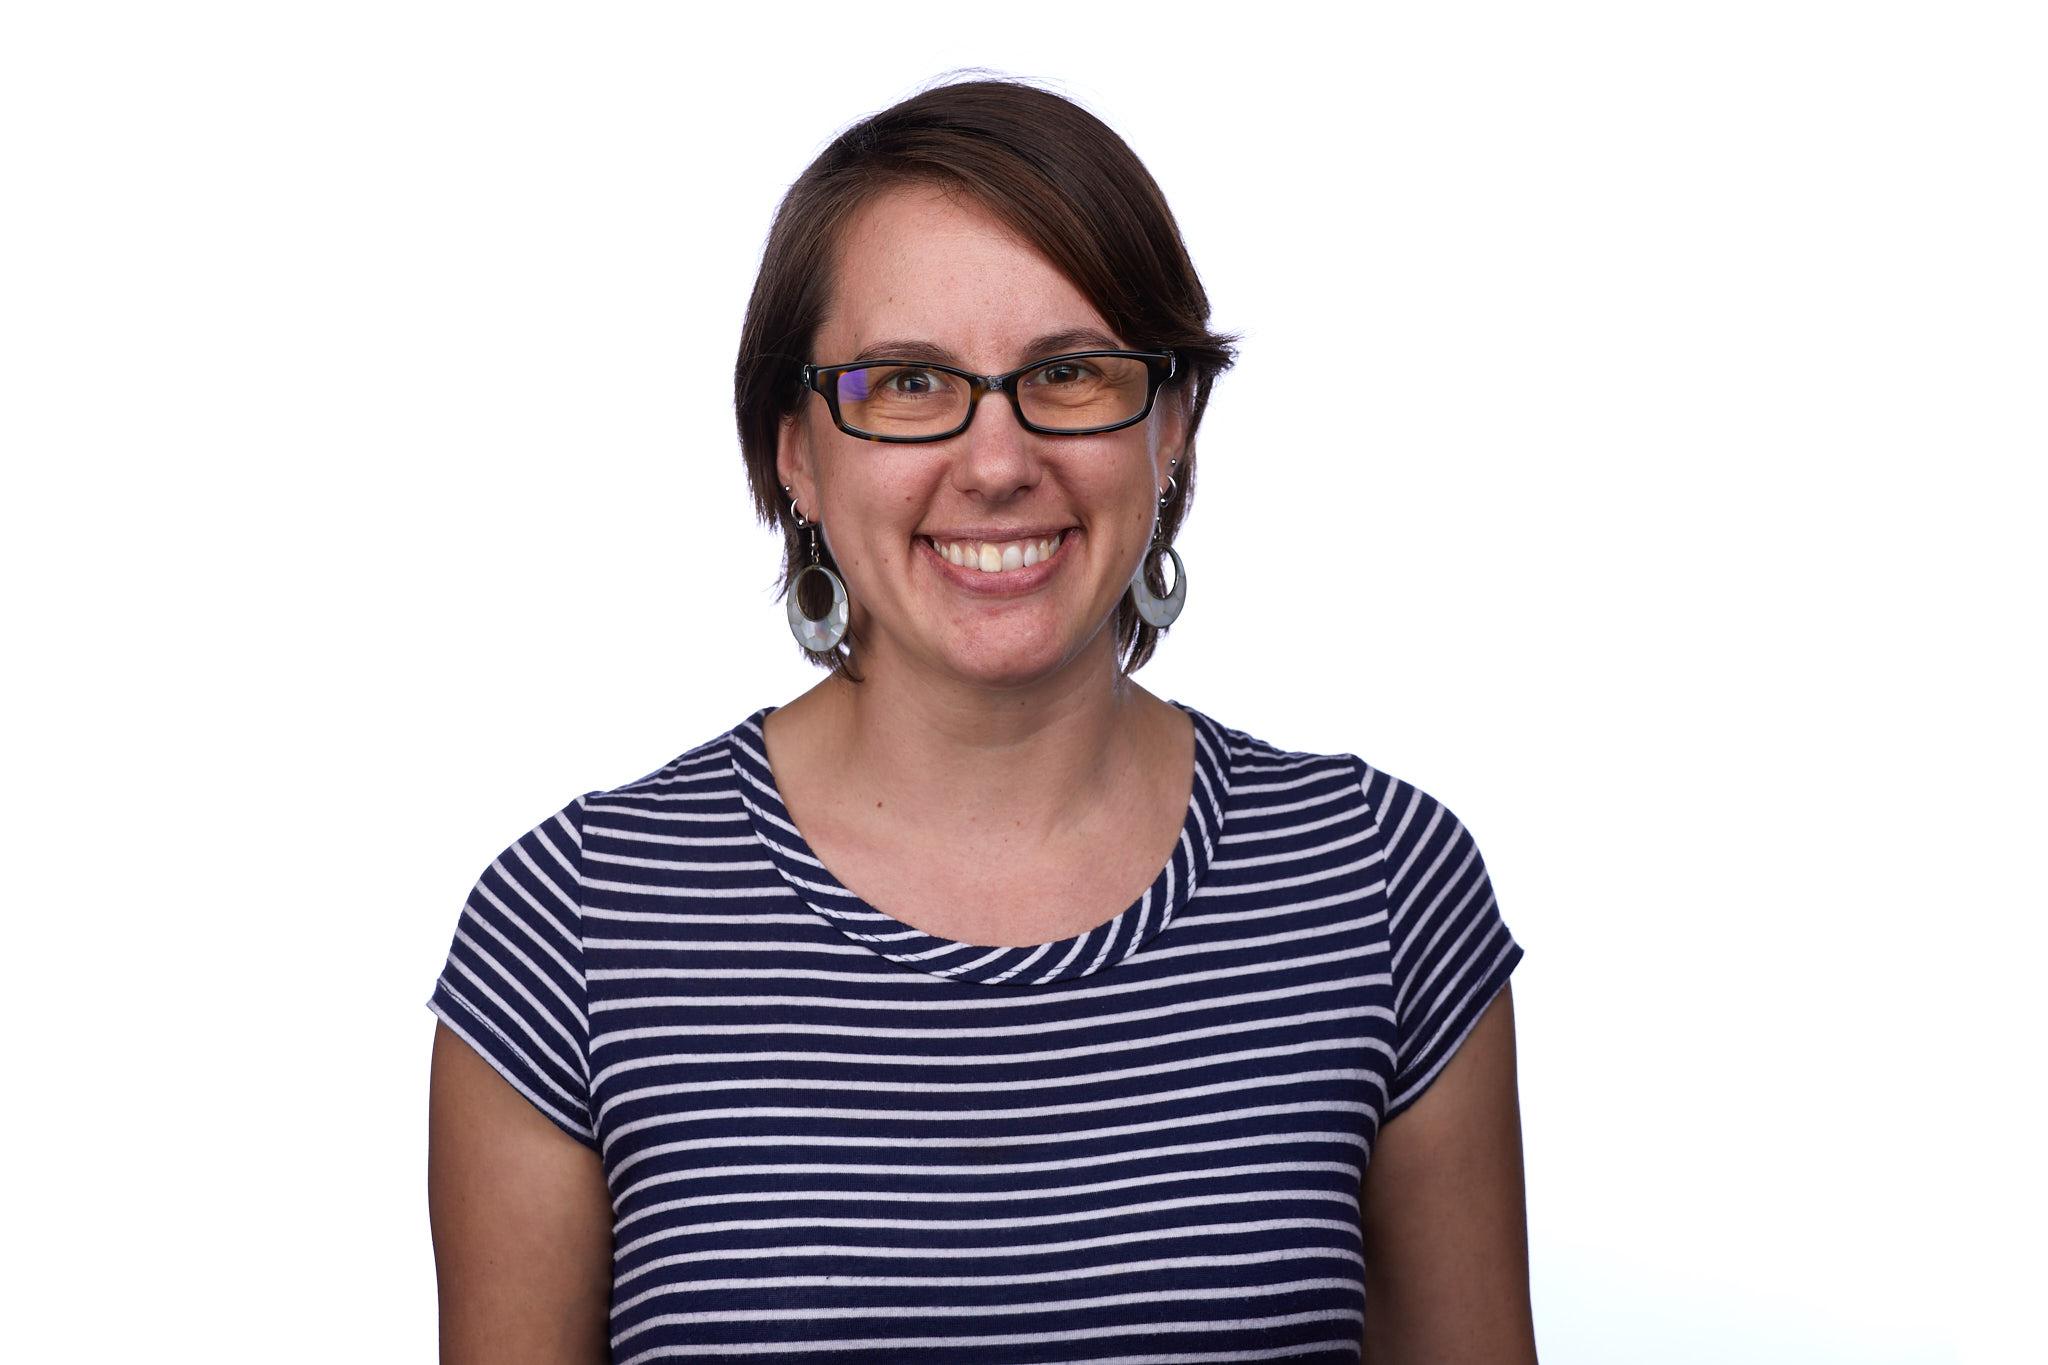 Ph.D. Candidate Alida Perrine Attends MLA 2020 as a Career Development Fellow